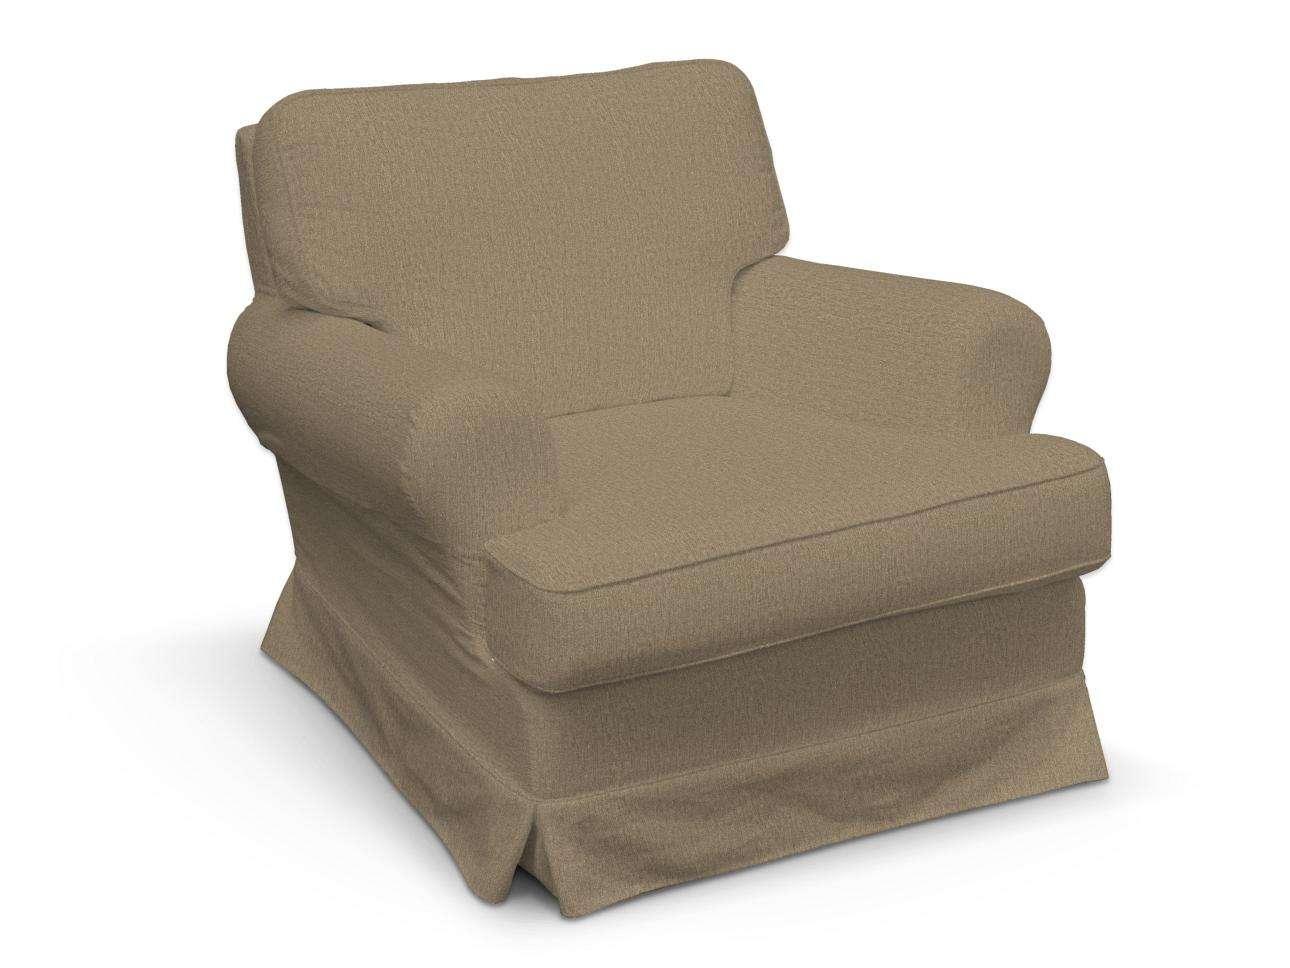 Pokrowiec na fotel Barkaby fotel Barkaby w kolekcji Chenille, tkanina: 702-21